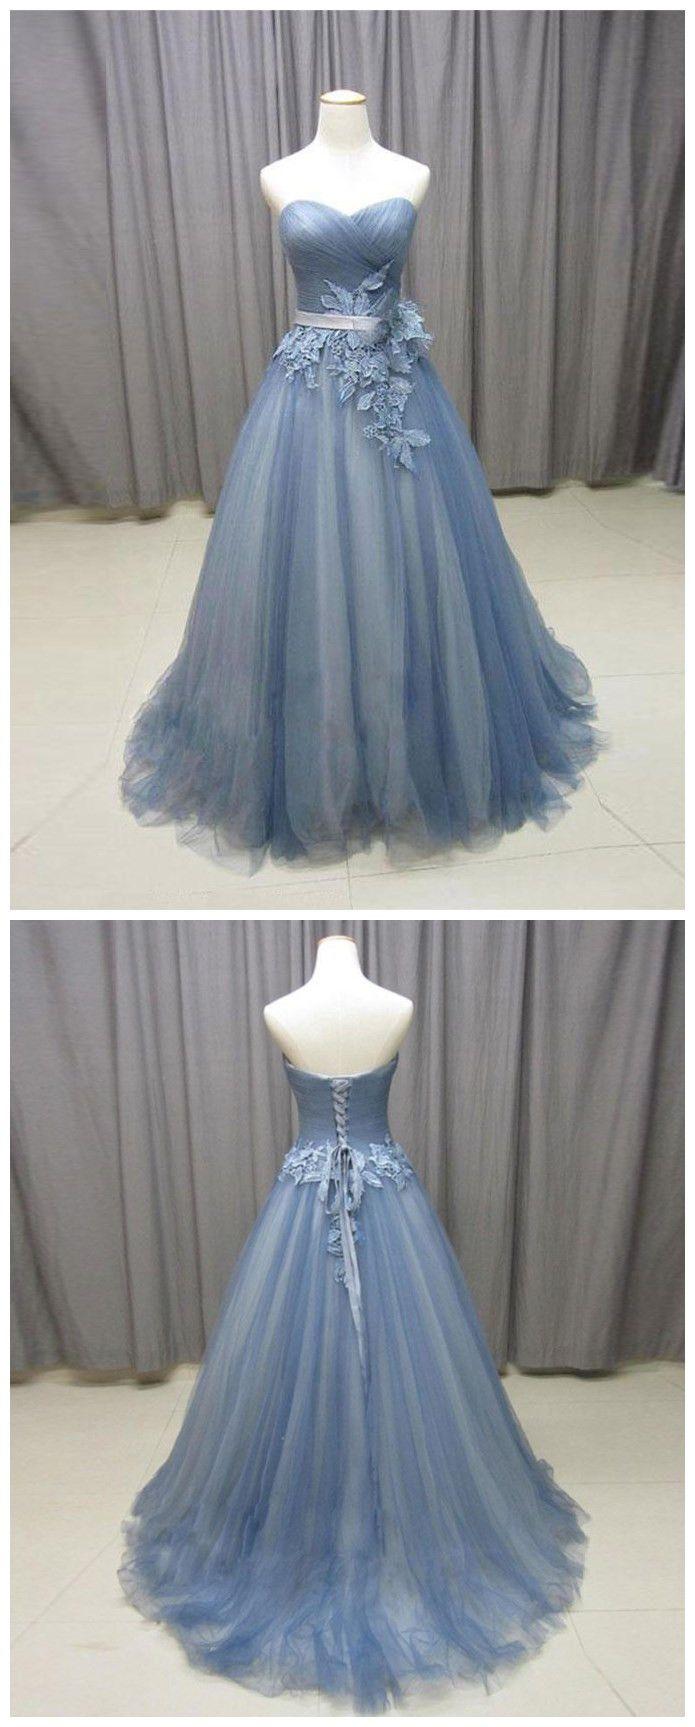 prom dresses long,prom dresses strapless,prom dresses a line,prom dresses modest,prom dresses 2018,prom dresses tulle,prom dresses applique #sweeheart #blue #cheap #2018